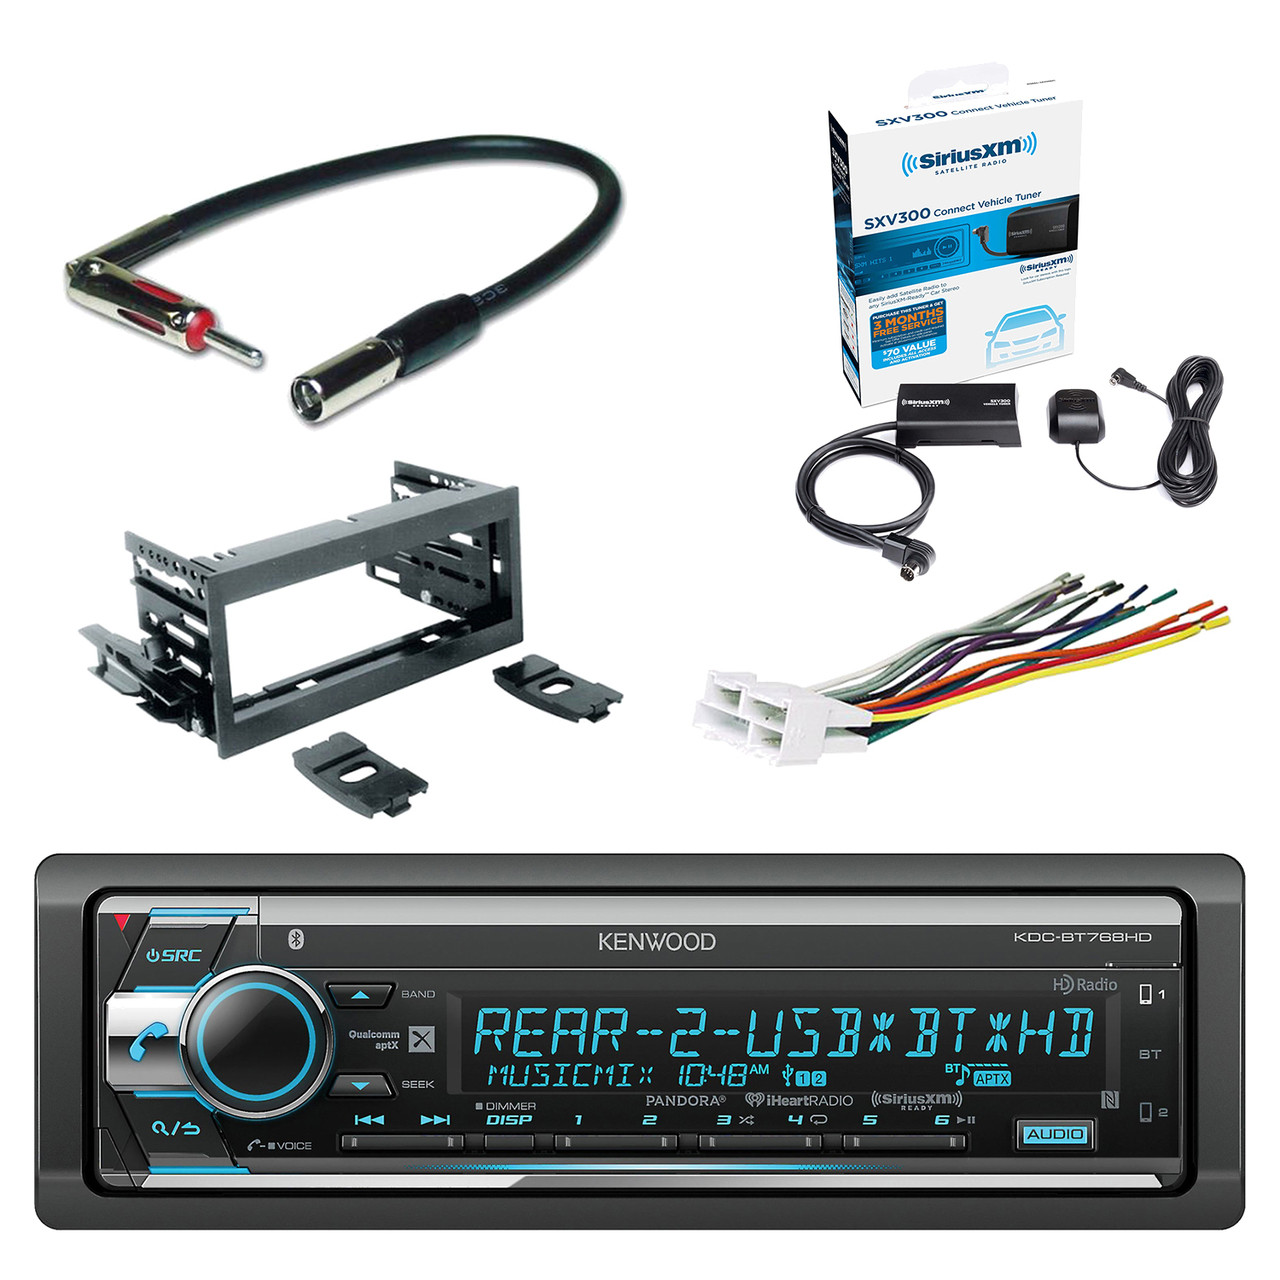 medium resolution of kenwood single din cd am fm car audio receiver with bluetooth xm radio wiring harness adapter